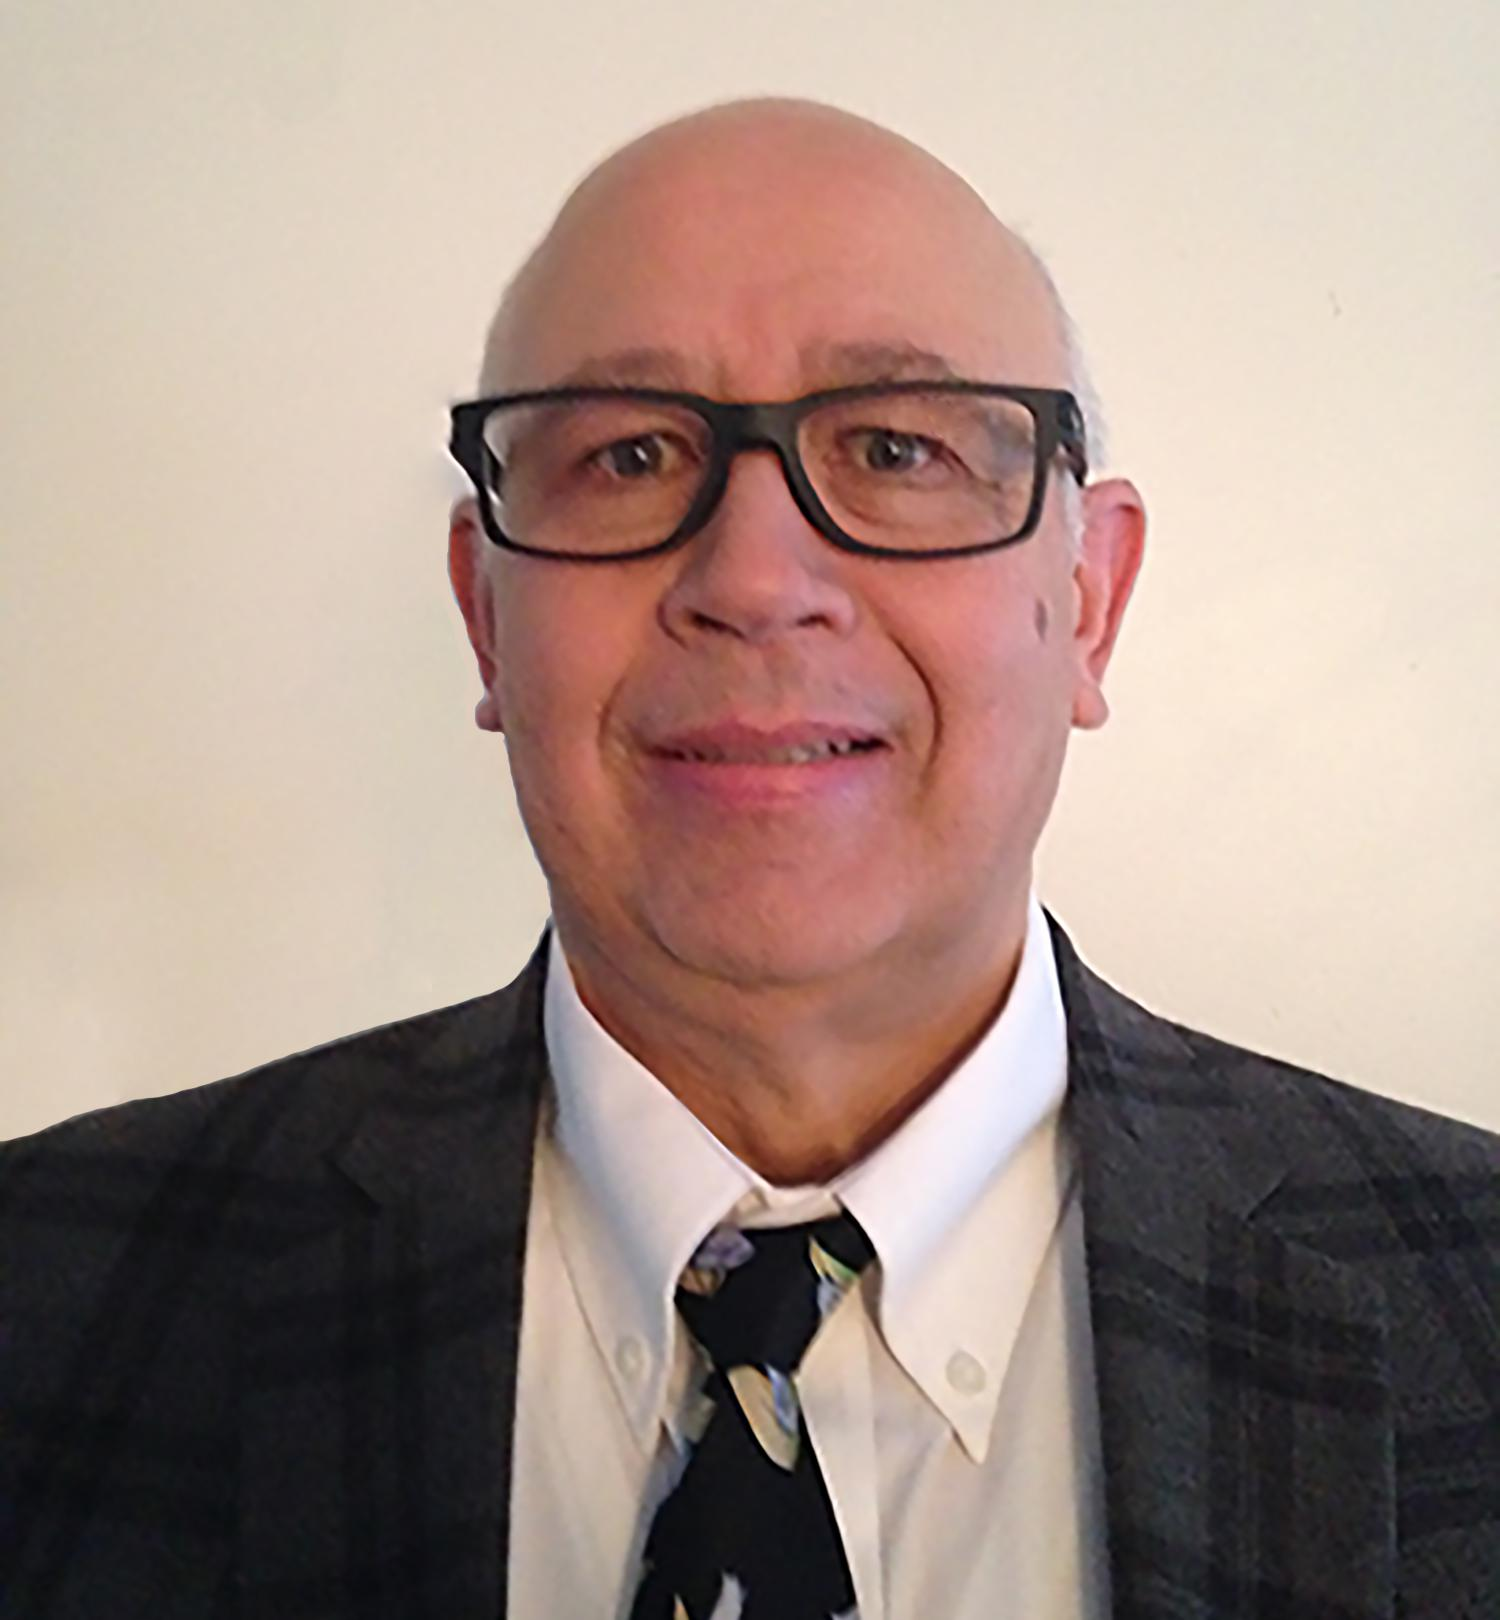 Kenneth M. Wapnitsky, CFP® Profile Photo